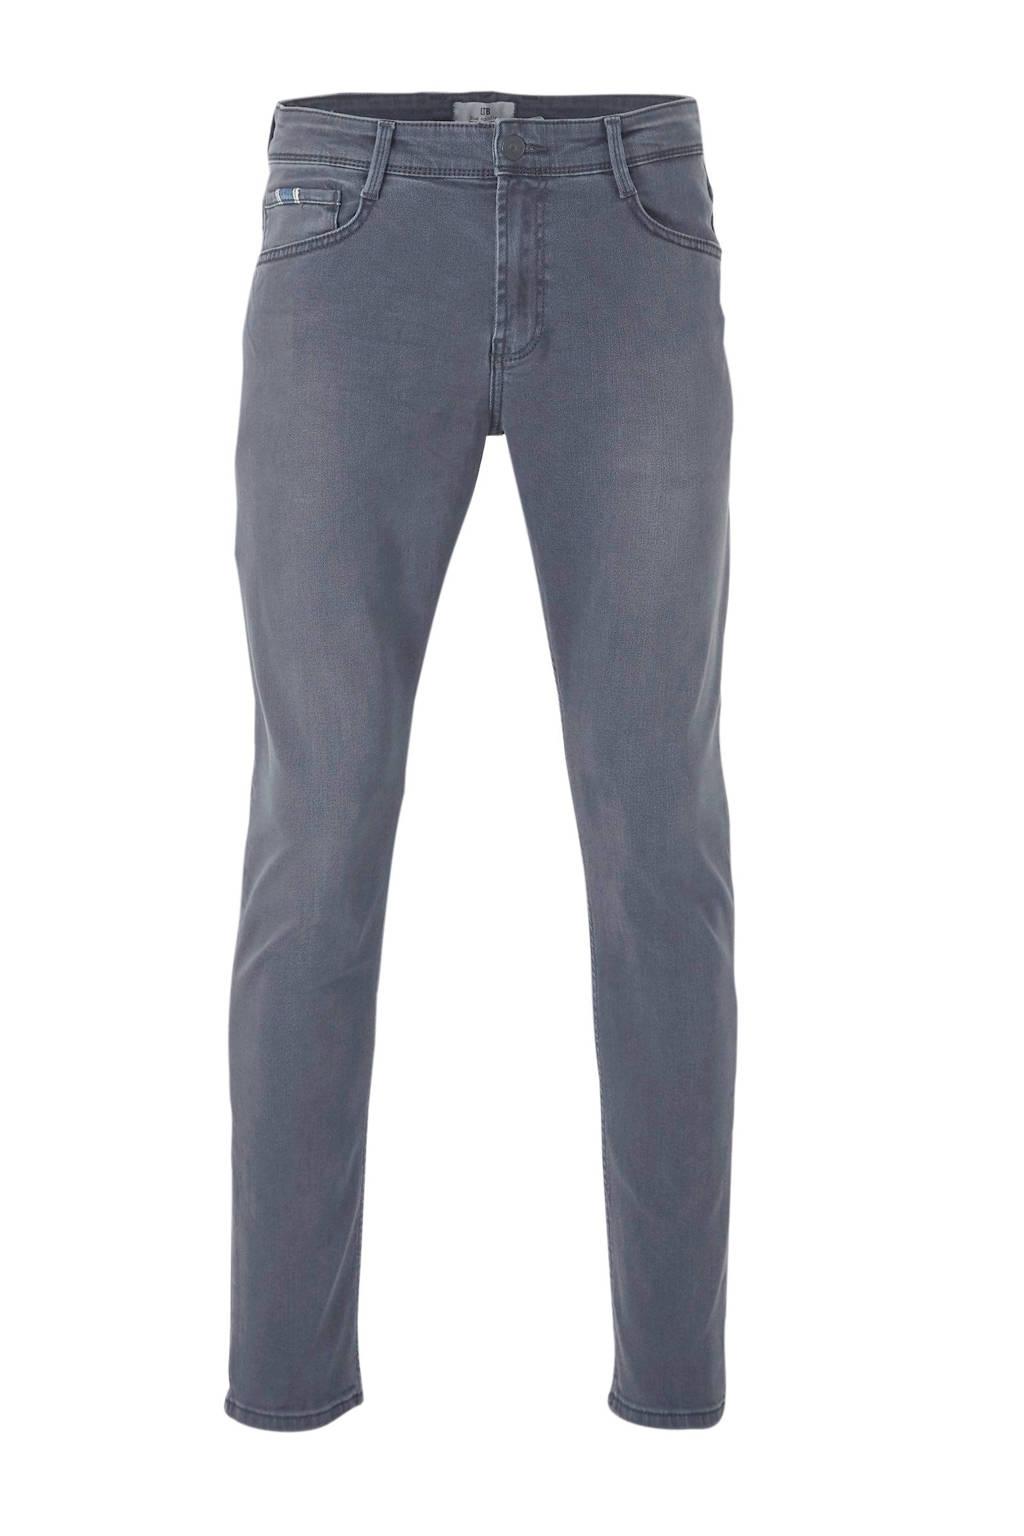 LTB slim fit jeans grijs, Grijs